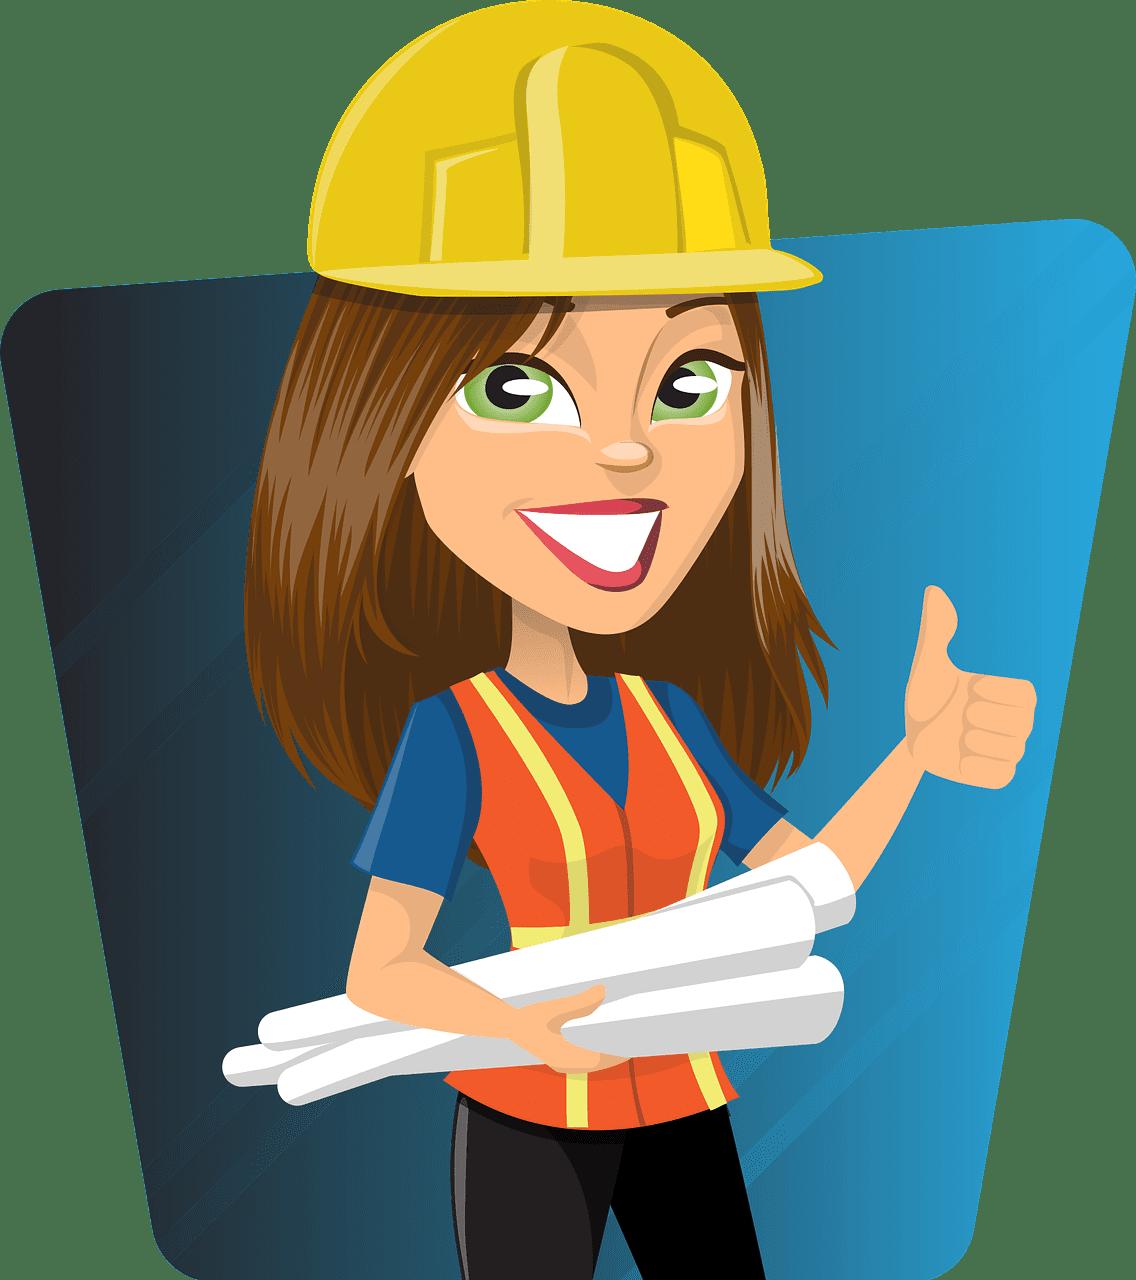 Get An Industrial Portable Heater, heater rentals, construction heater, industrial heaters, construction heaters, industrial heater, commercial heaters, kcd energy, ny, nyc, new york, KCD Energy Company LLC